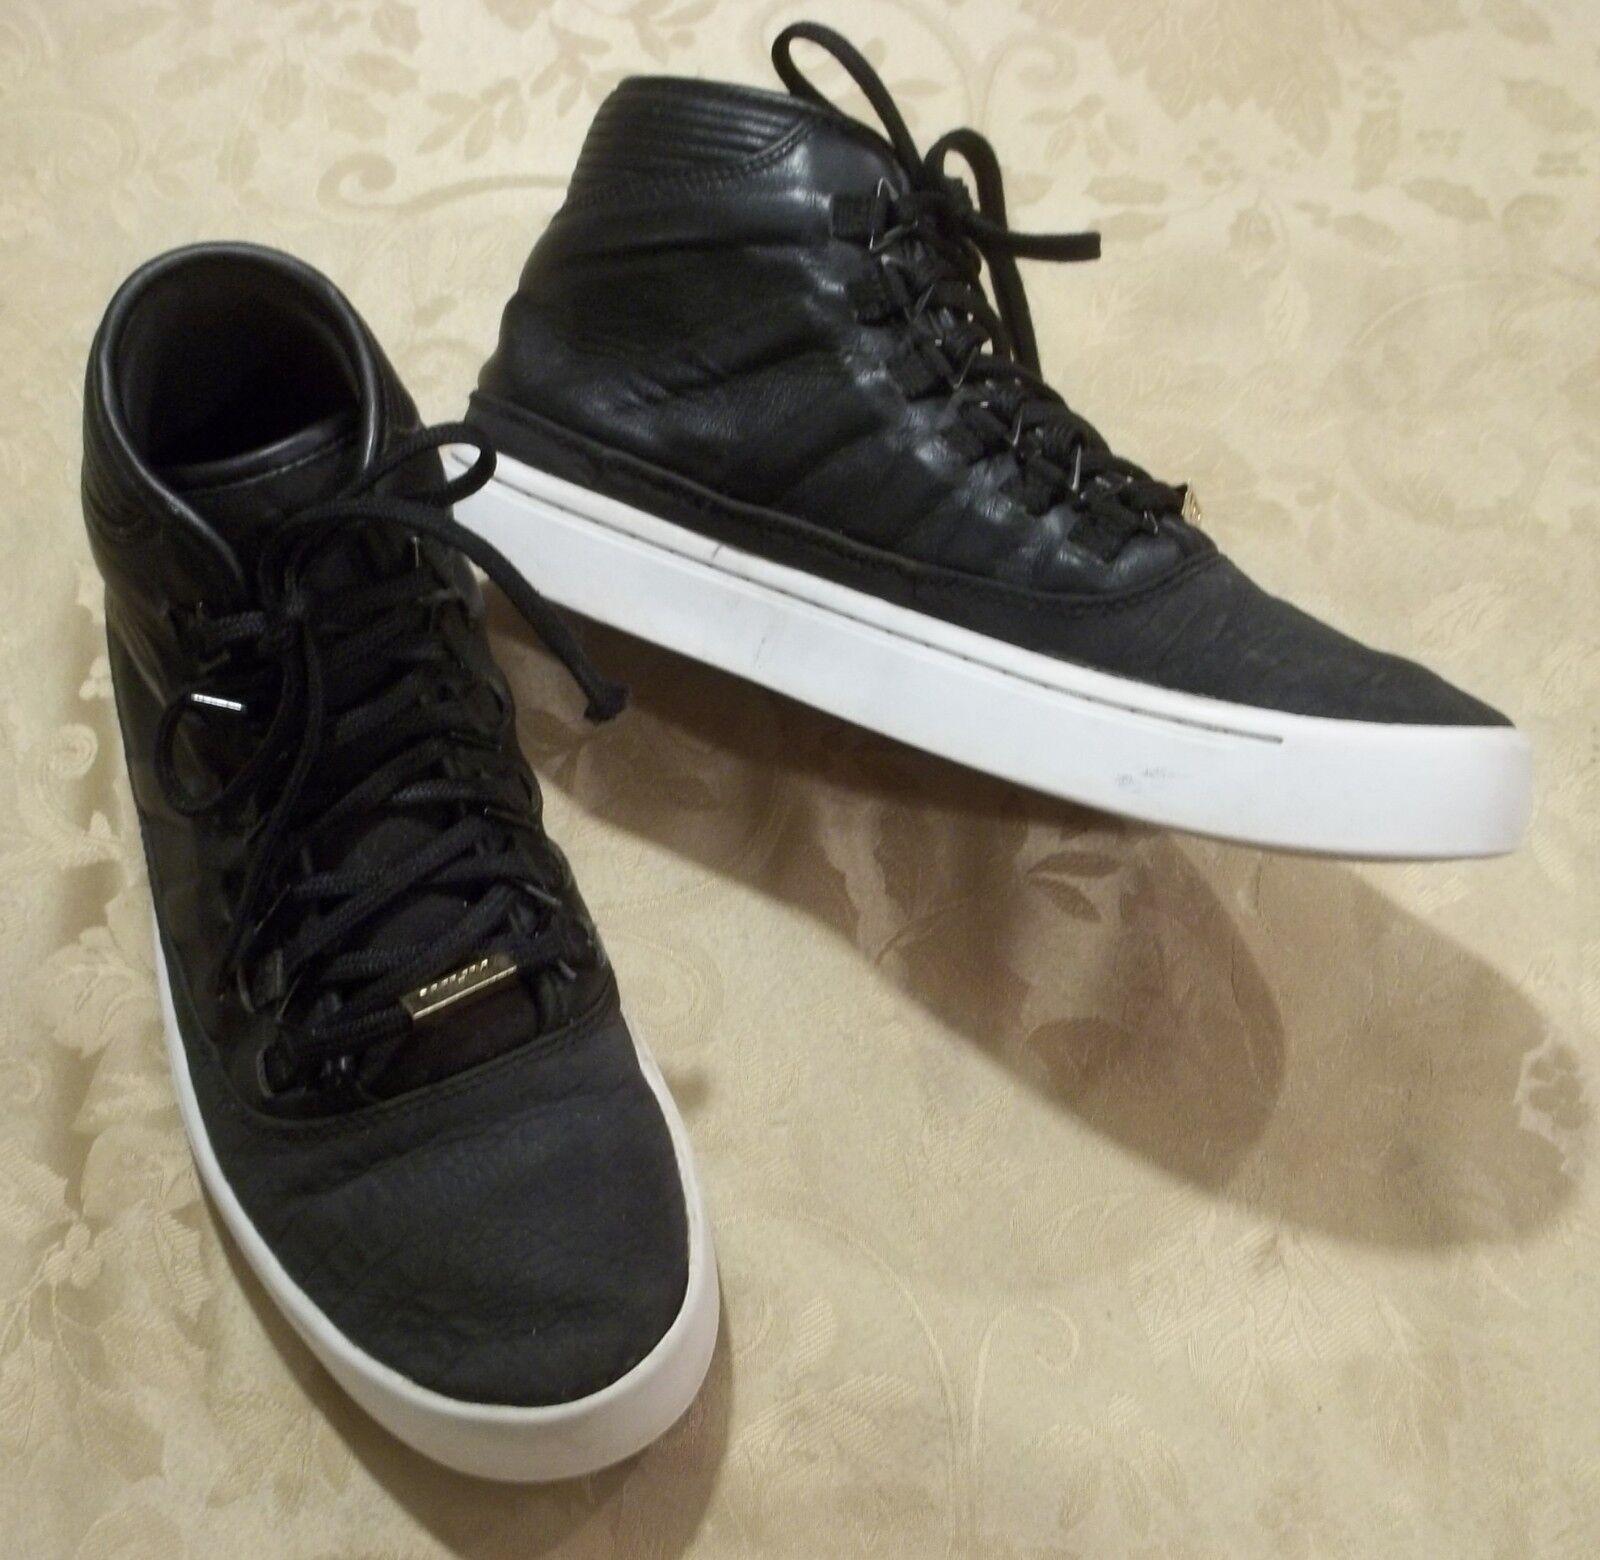 Hombre nike air Jordan ~ Negro Mid Top Sneakers Jumpman ~ tamaño 7,5 ~ Jumpman Sneakers zapatos baloncesto comoda y bonita 8a7436